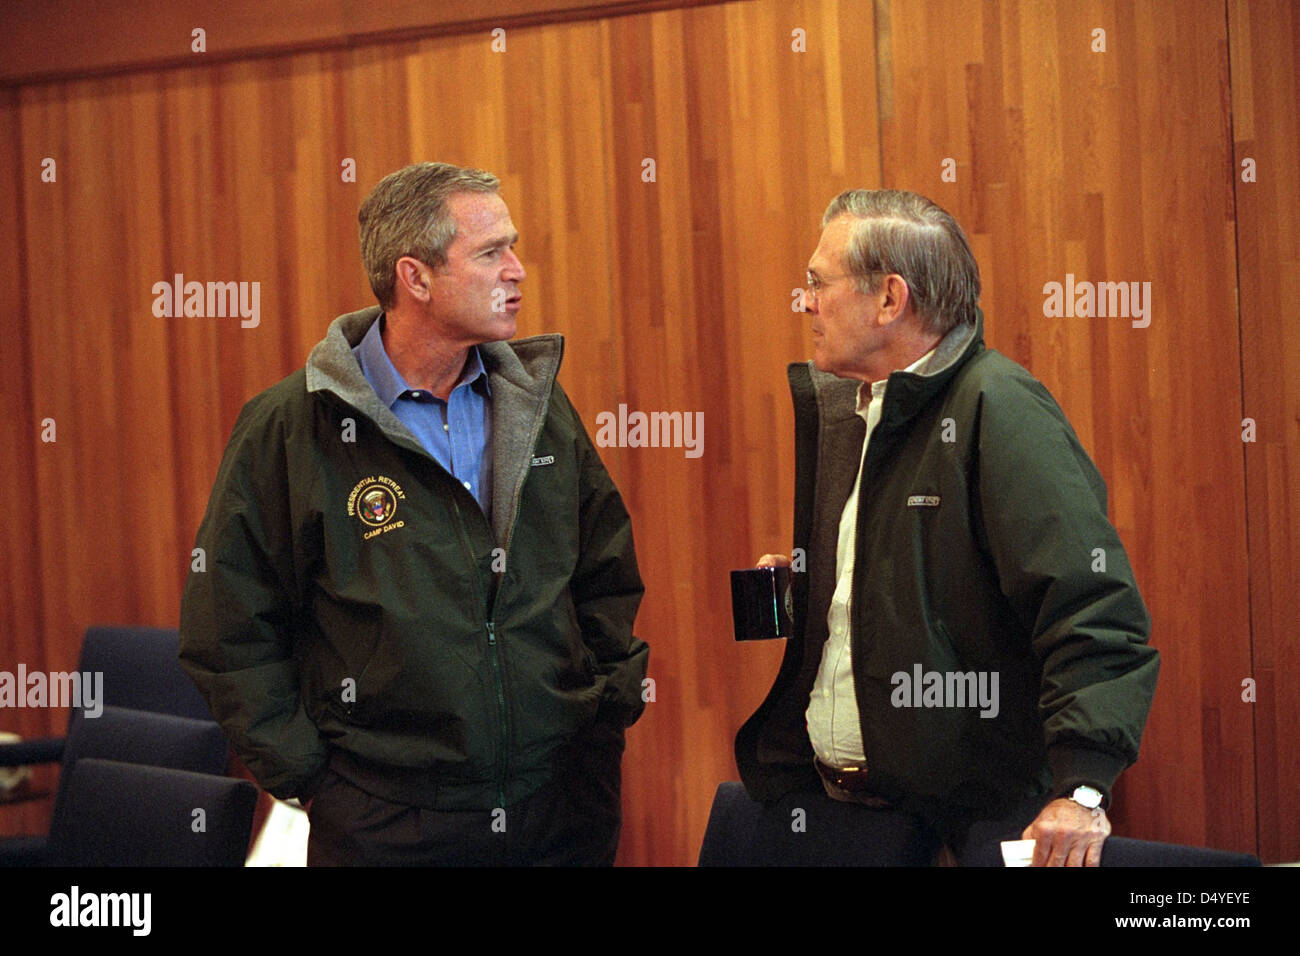 President George W. Bush talks with Secretary of Defense Donald Rumsfeld Saturday, Sept. 15, 2001, during a break - Stock Image